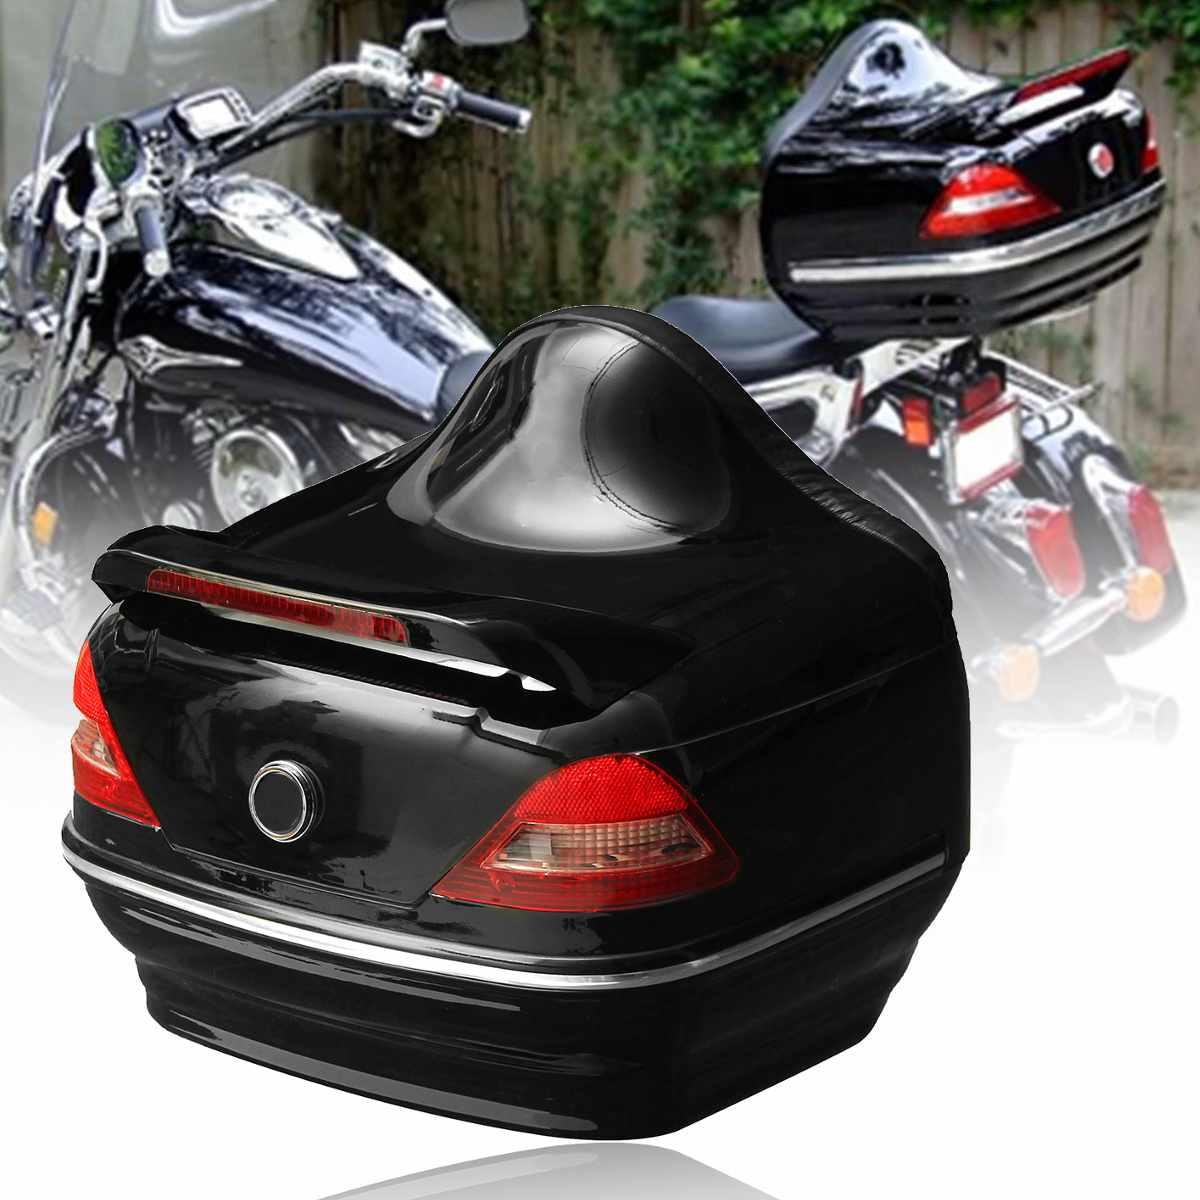 Black Motorcycle Trunk Tail Box W/Taillight For Harley /Honda /Yamaha /Suzuki Vulcan Cruiser black motorcycle trunk tail box w taillight for harley honda yamaha suzuki vulcan cruiser